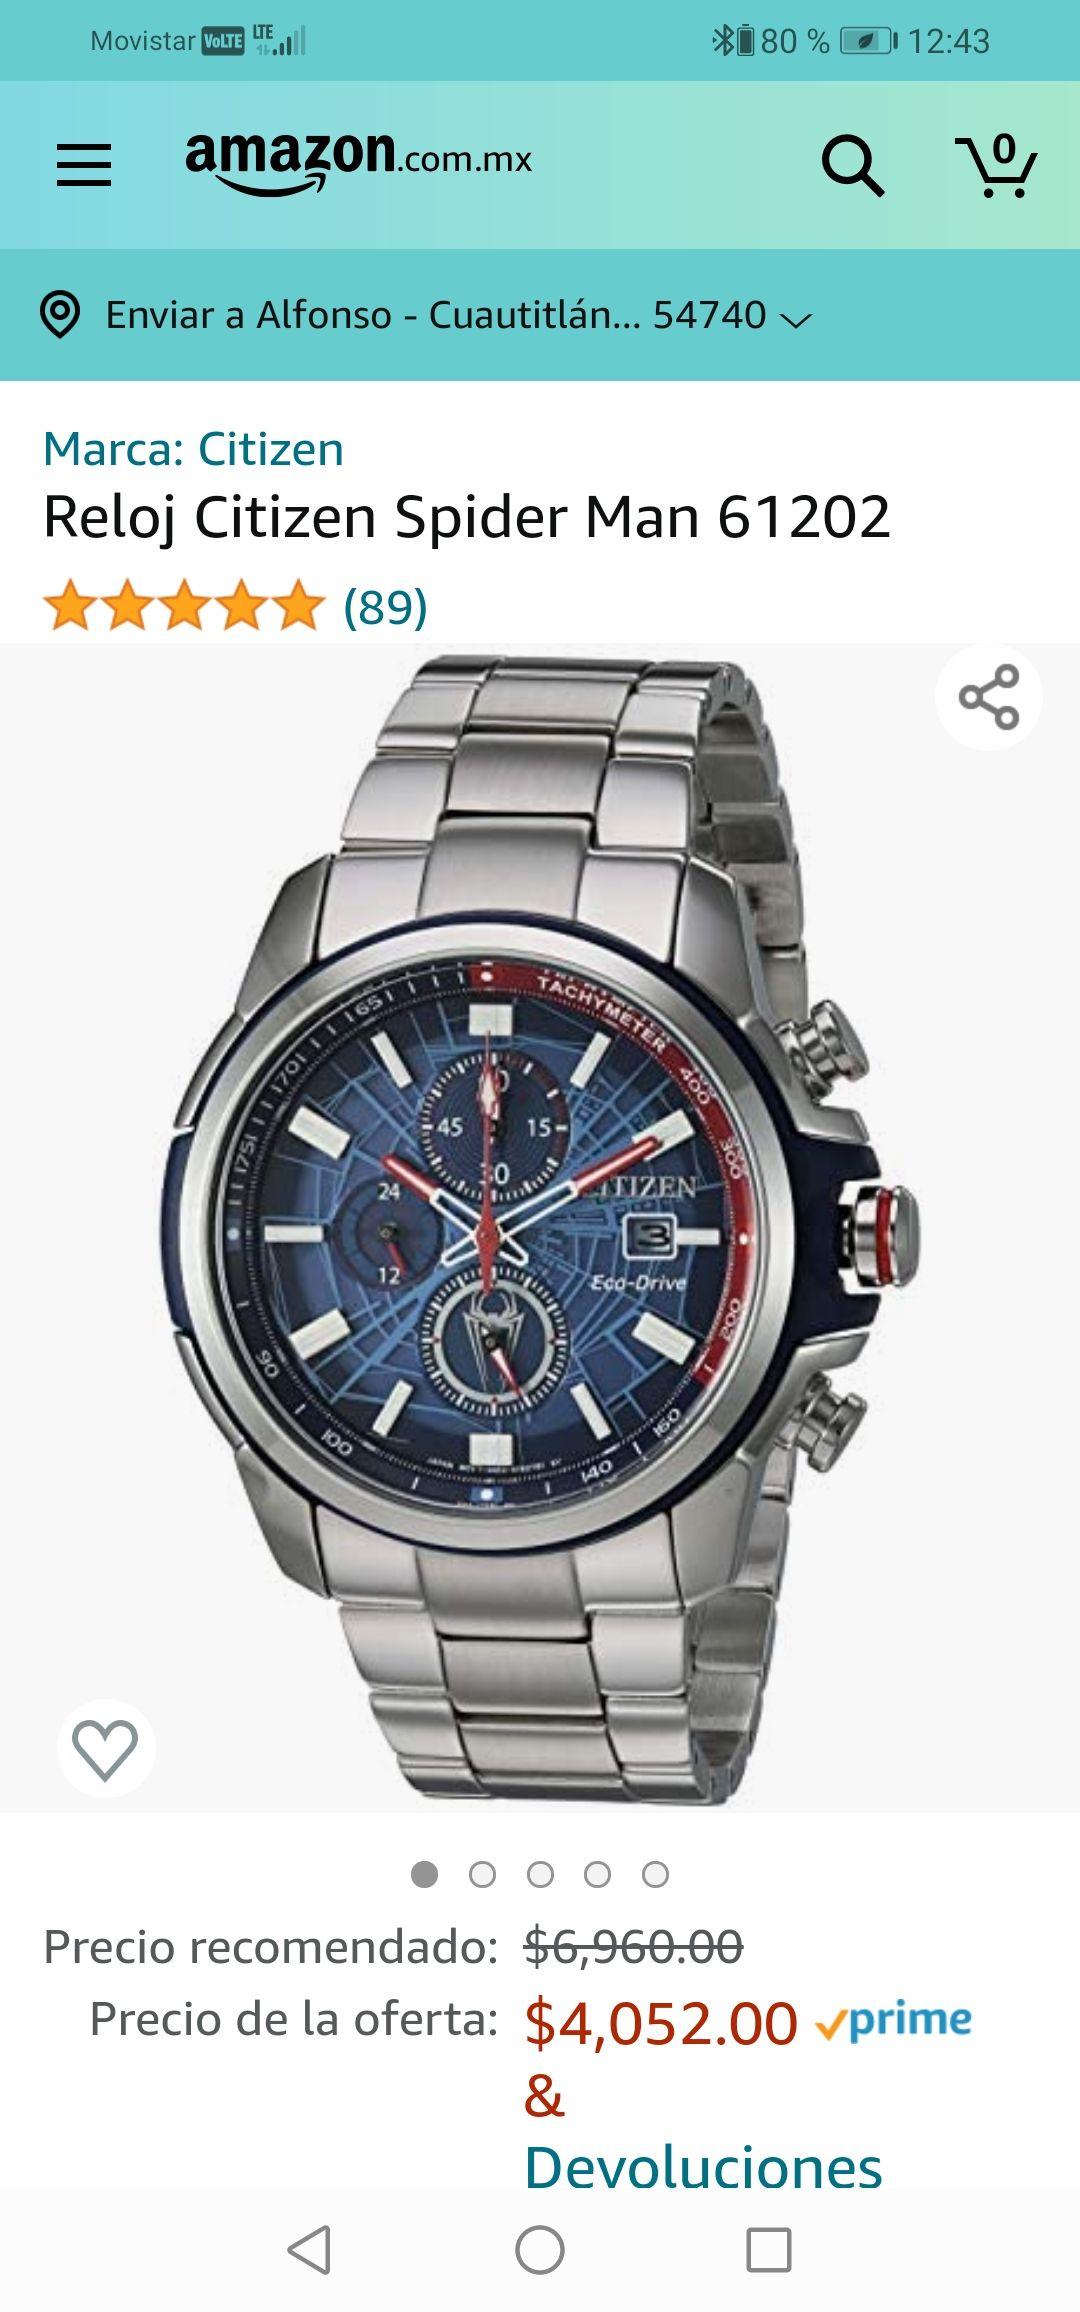 Amazon : Reloj Citizen Spider Man 61202